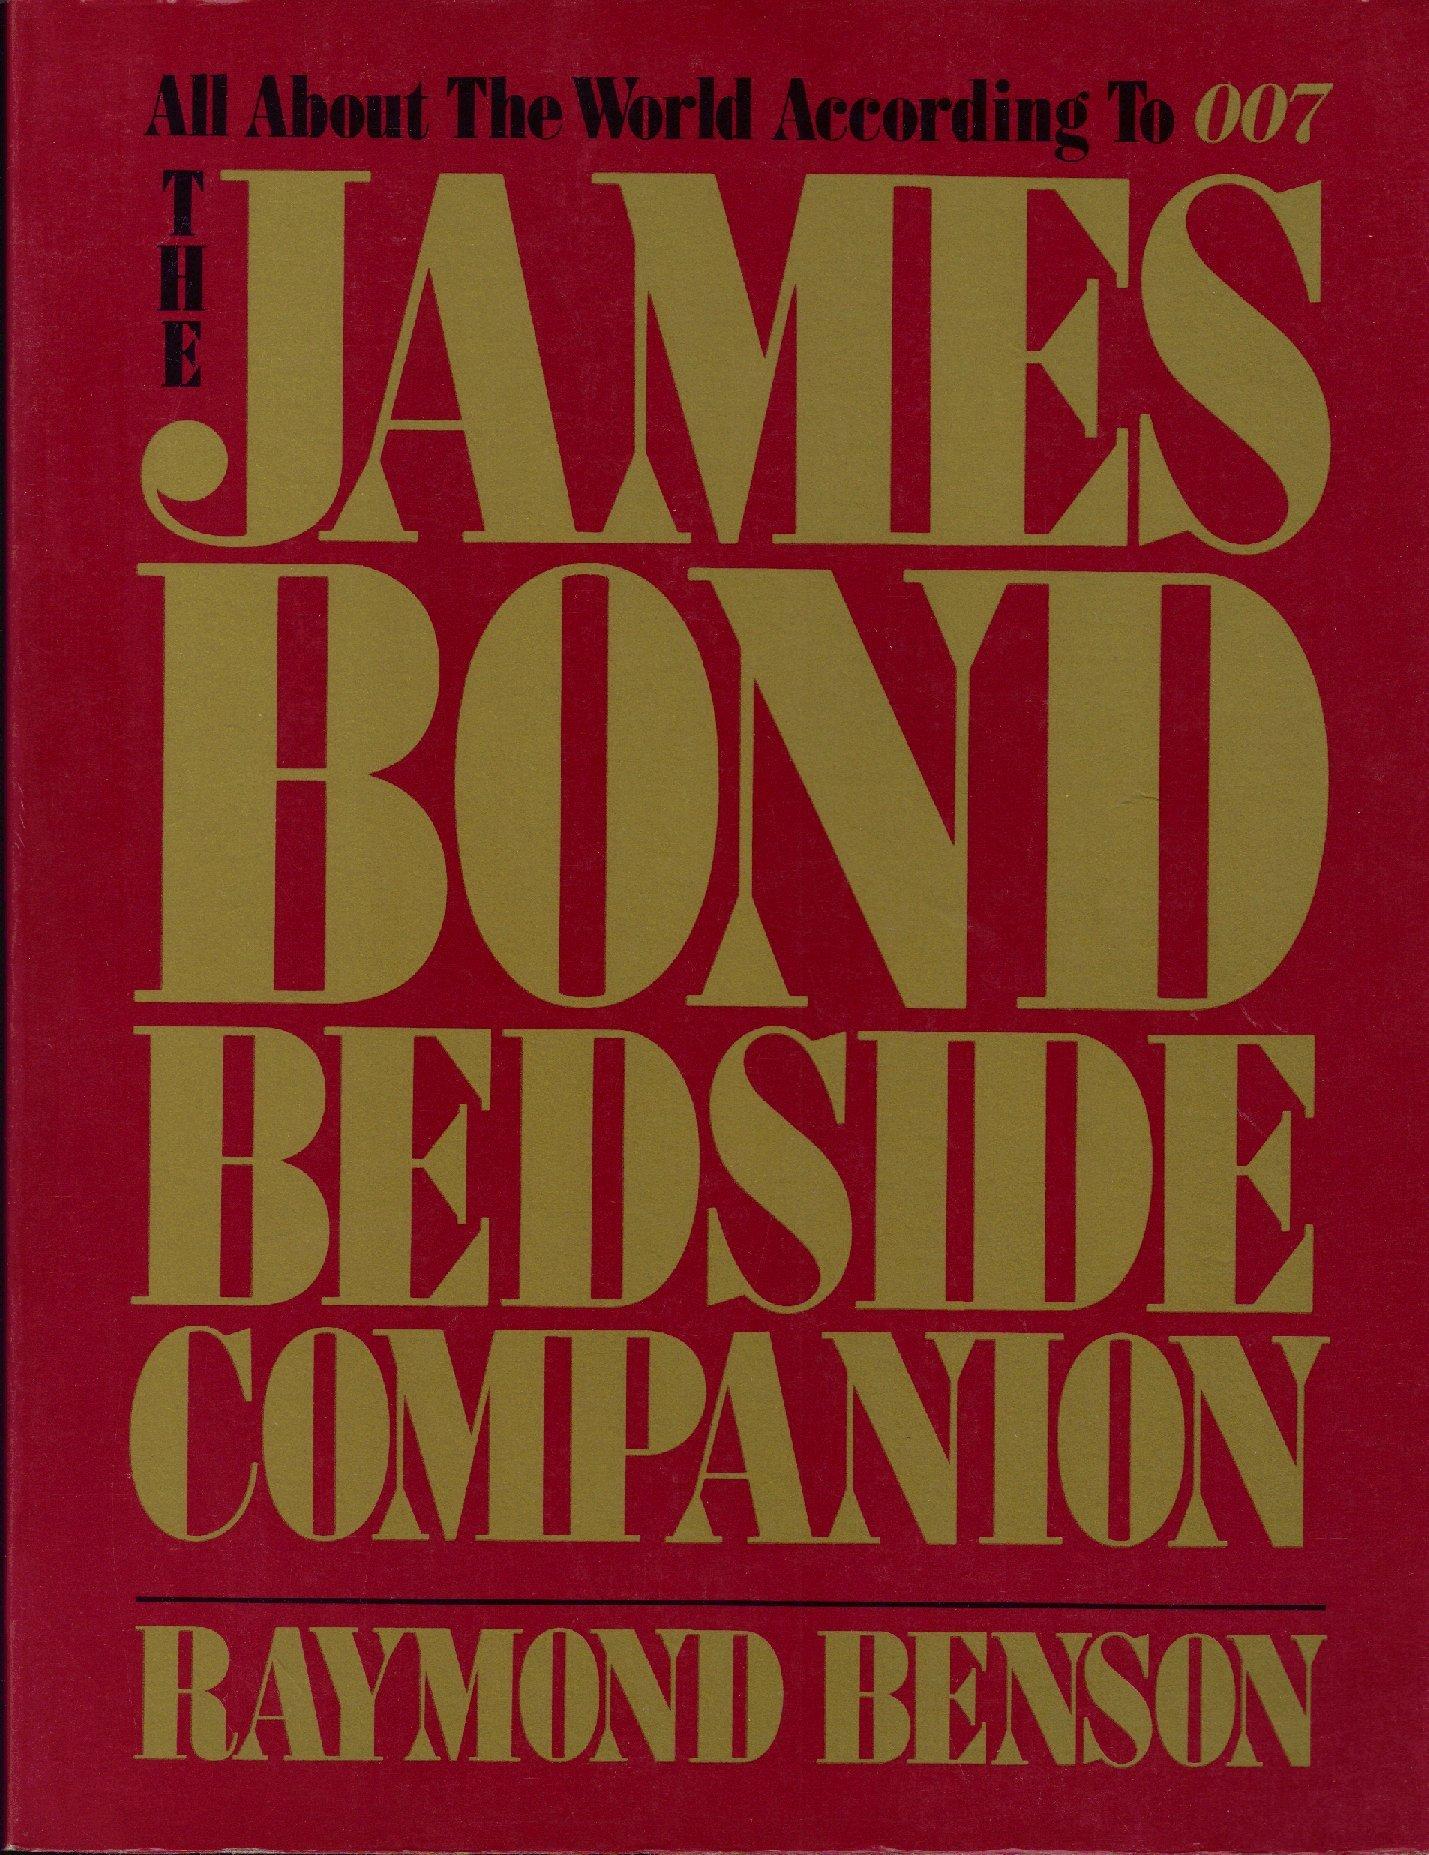 James Bond Bedside Companion: Amazon.co.uk: Raymond Benson: 9780396083849:  Books